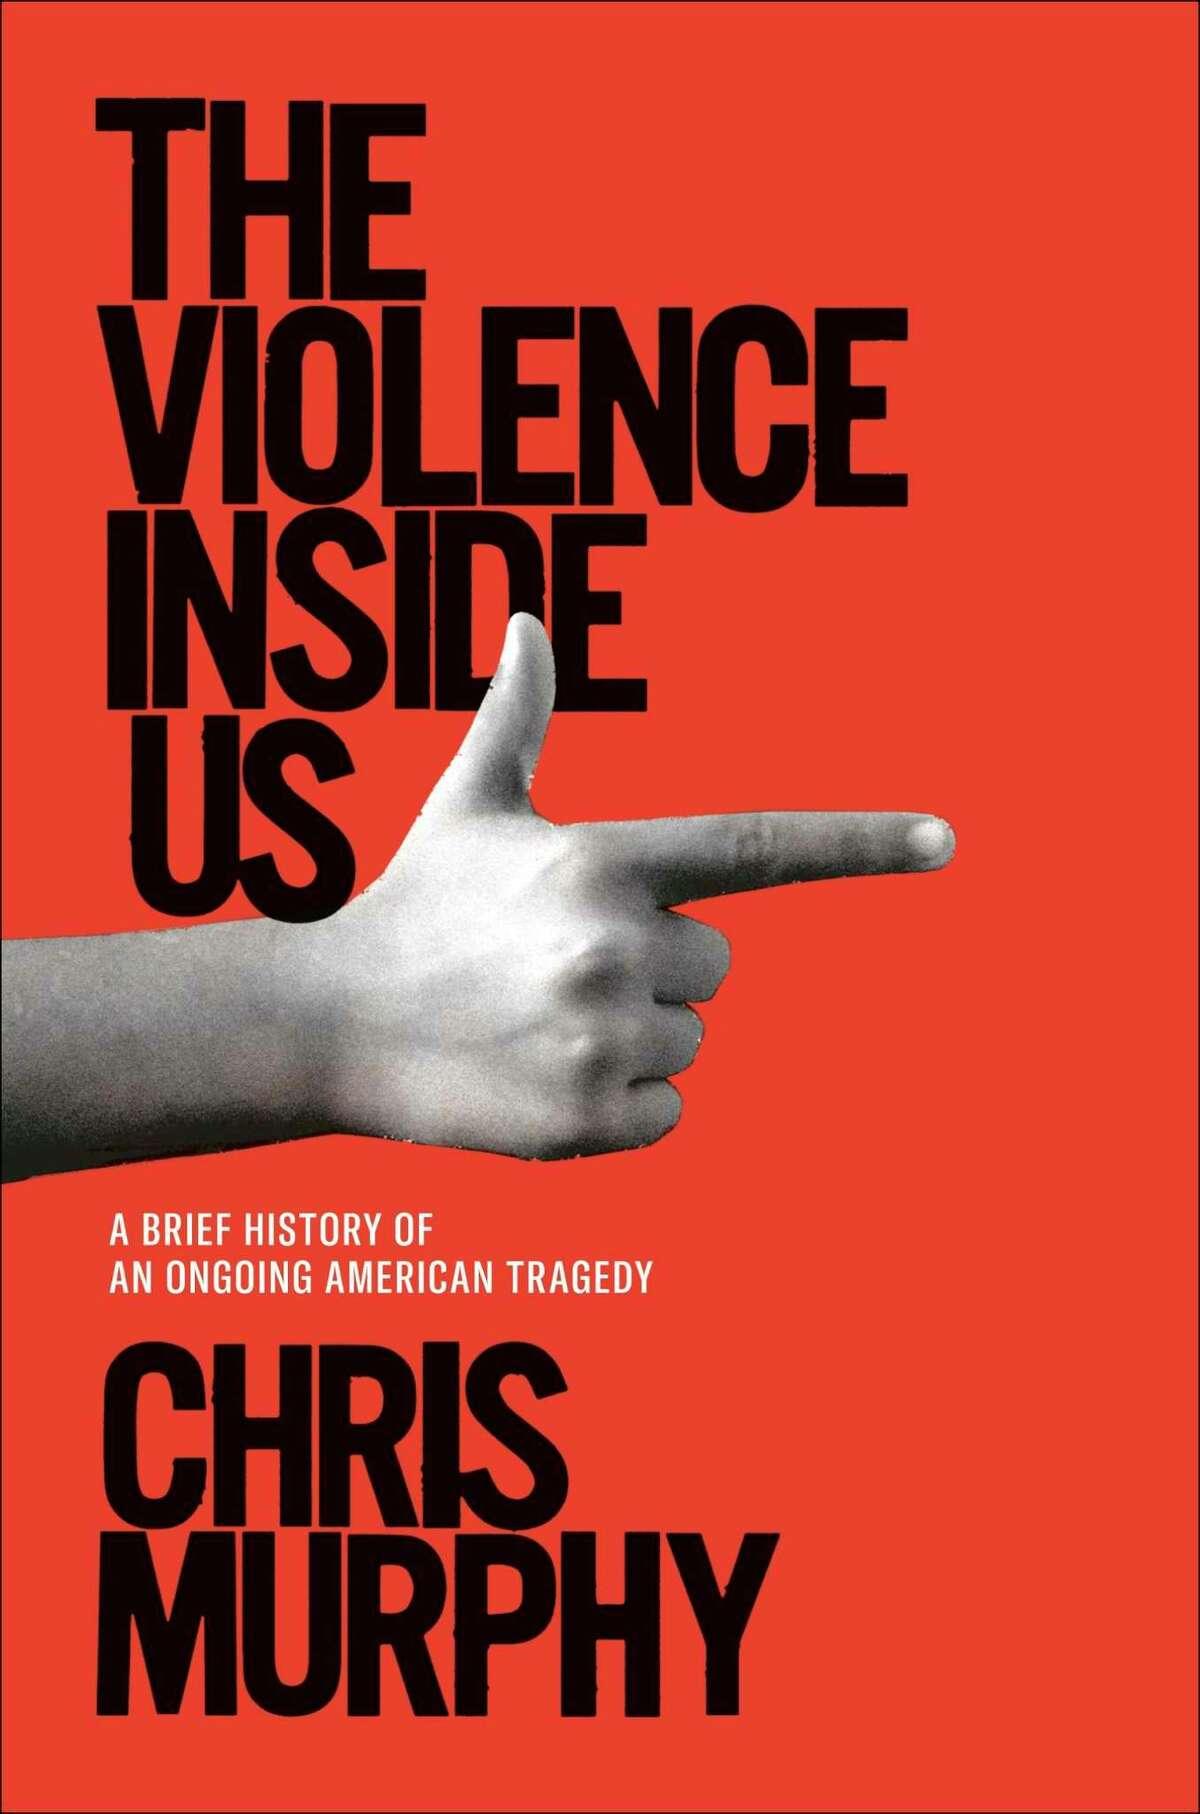 """The Violence Inside Us"" is the first book written by U.S. Sen. Chris Murphy, D-Conn. It's subject is American gun violence."